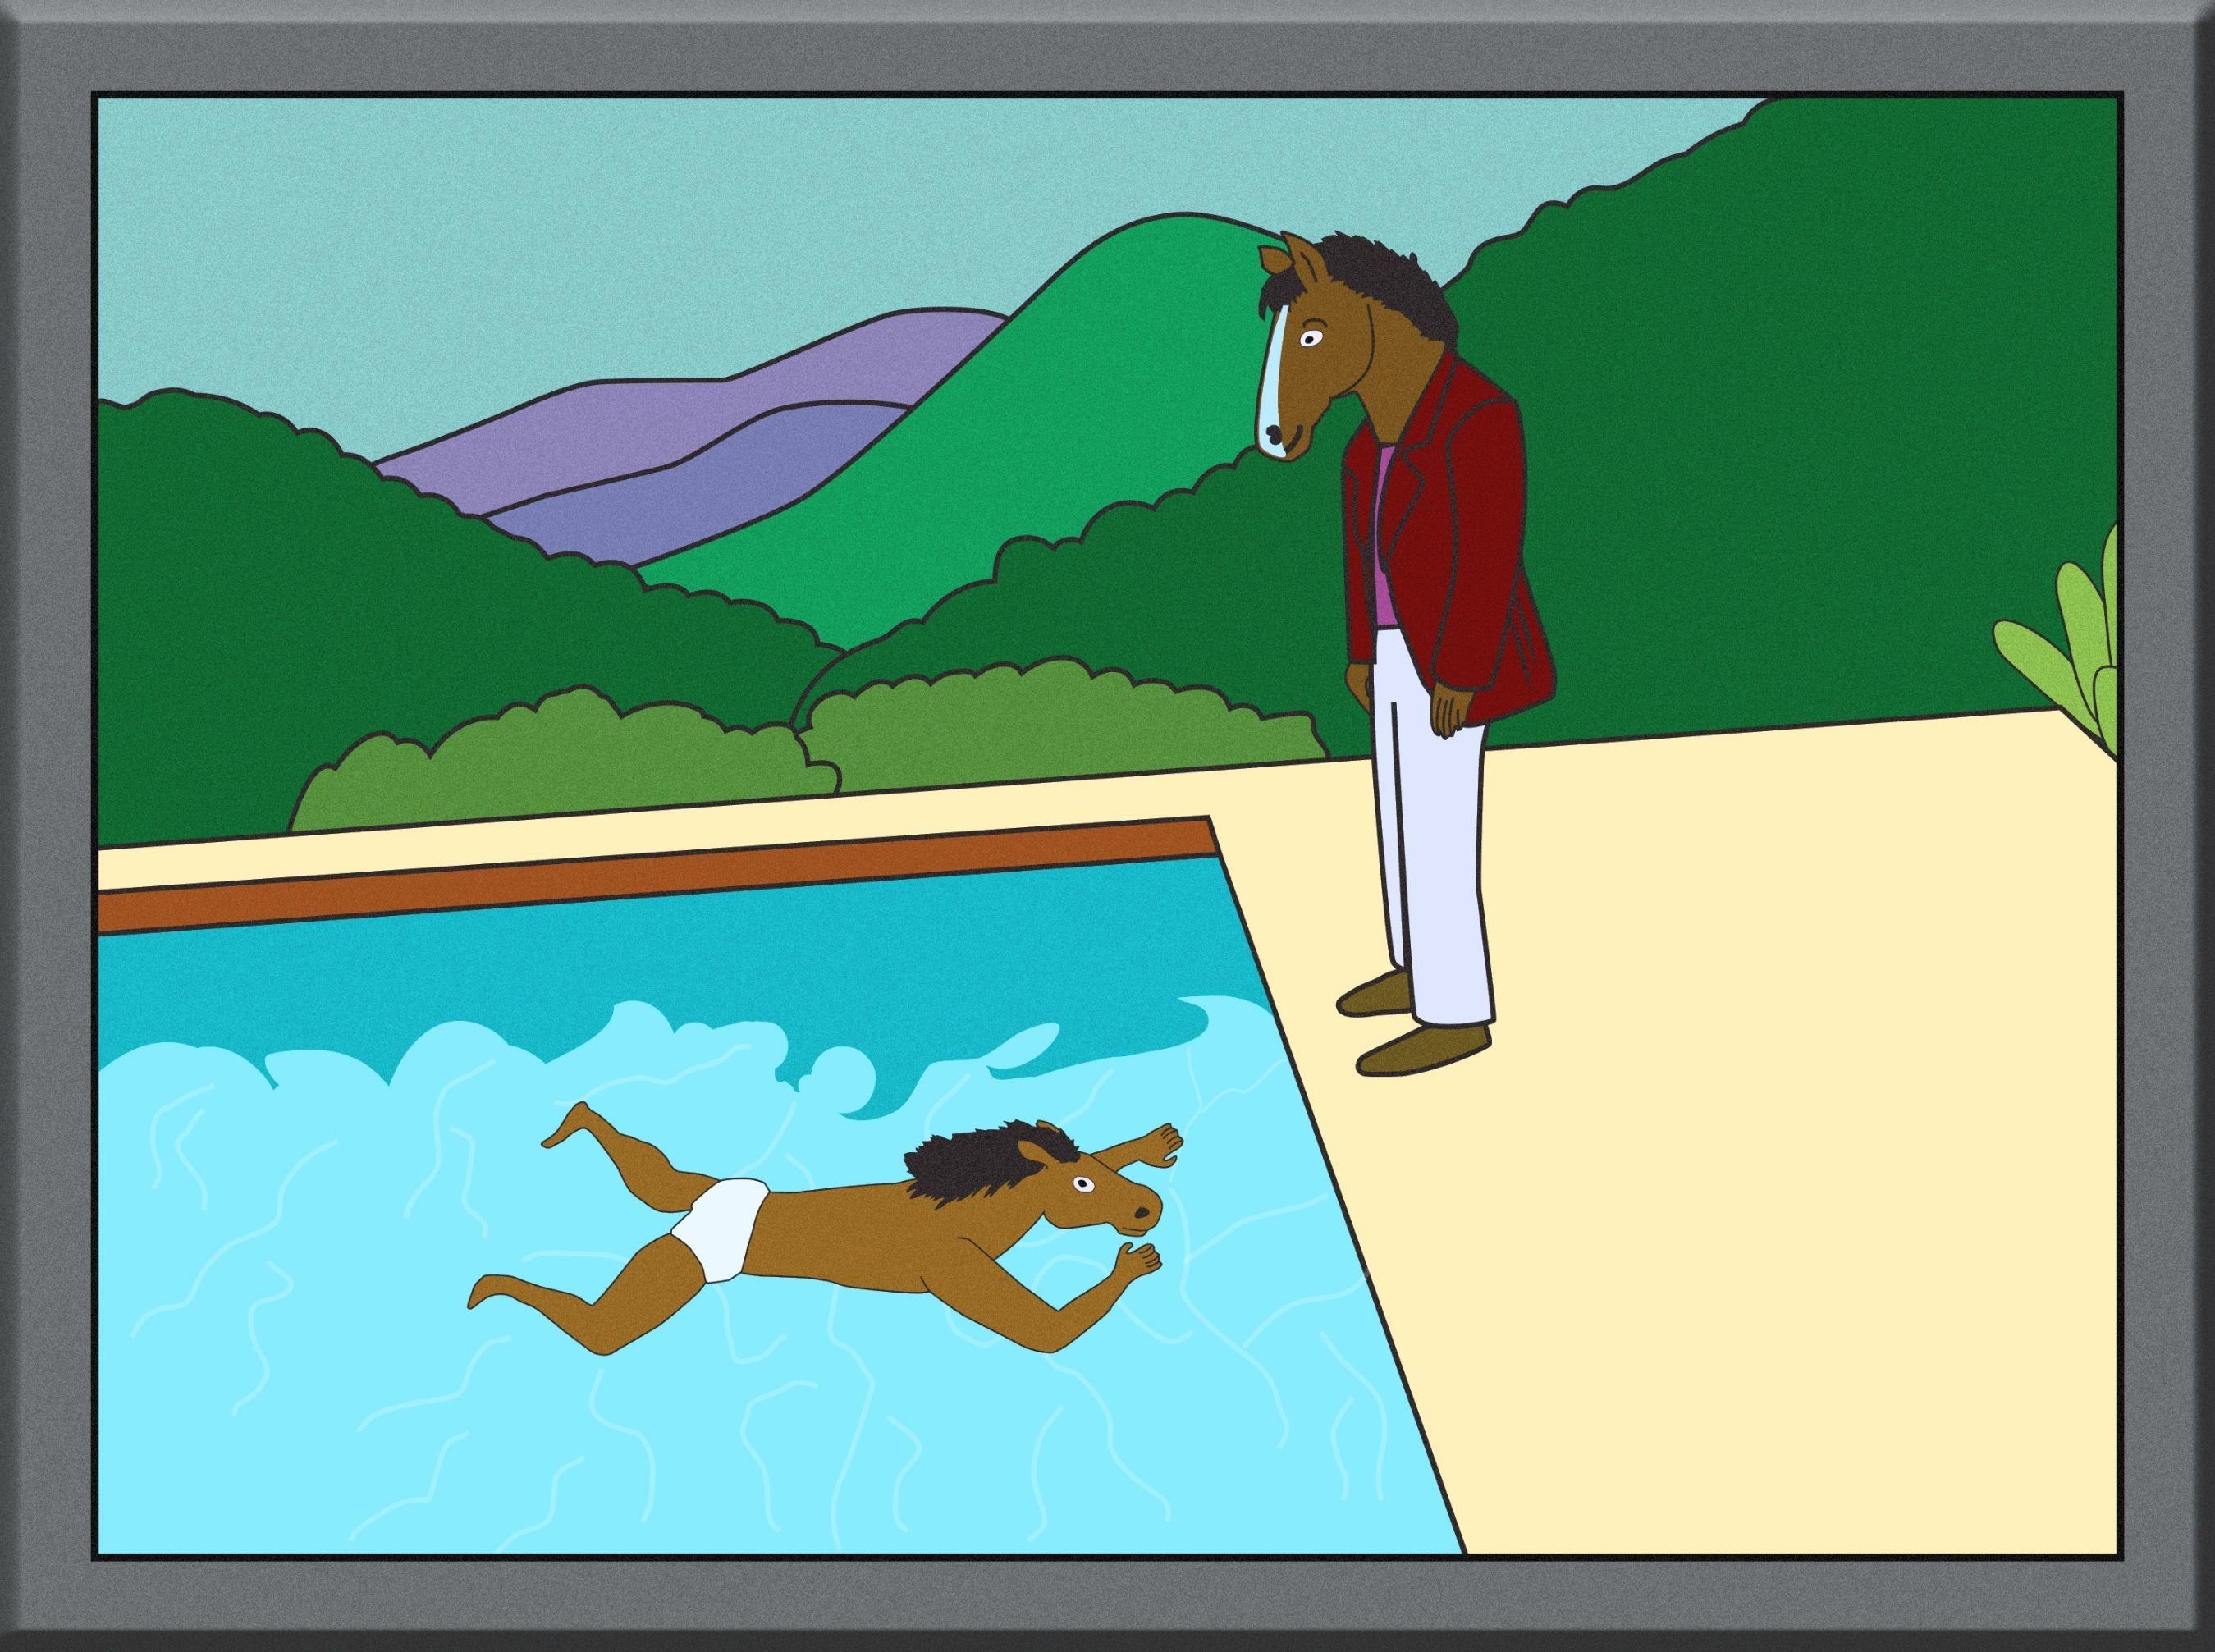 Bojack Horseman Wallpaper 88 Immagini